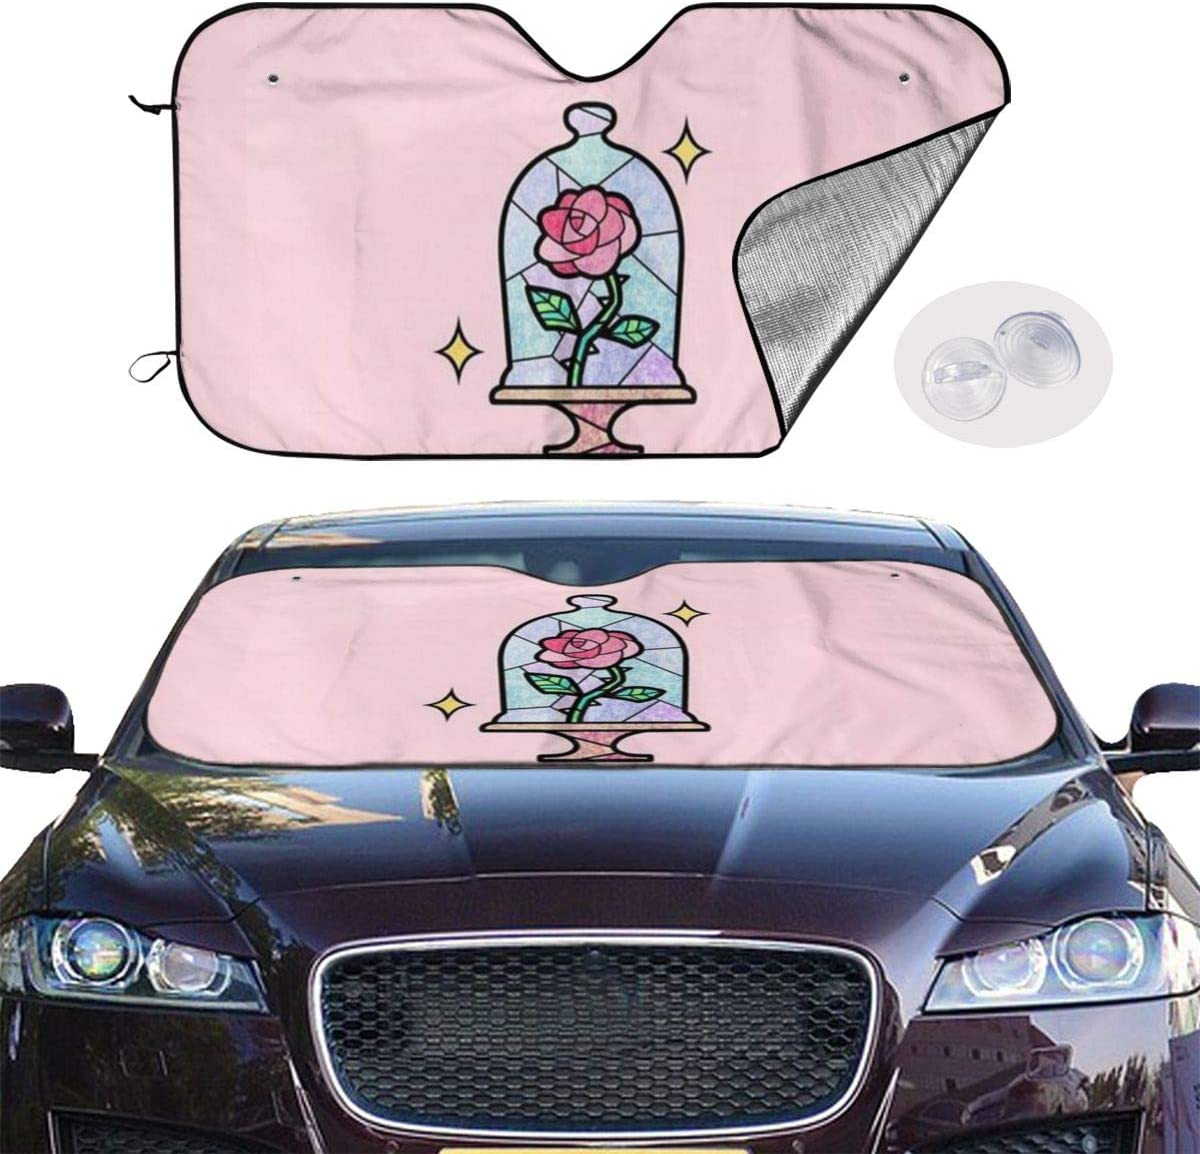 DNBCJJ Car Windshield Sunshade Pink Dumbo Sun Heat Shield Shade Uv Ray Visor Protector Keep Vehicle Cool